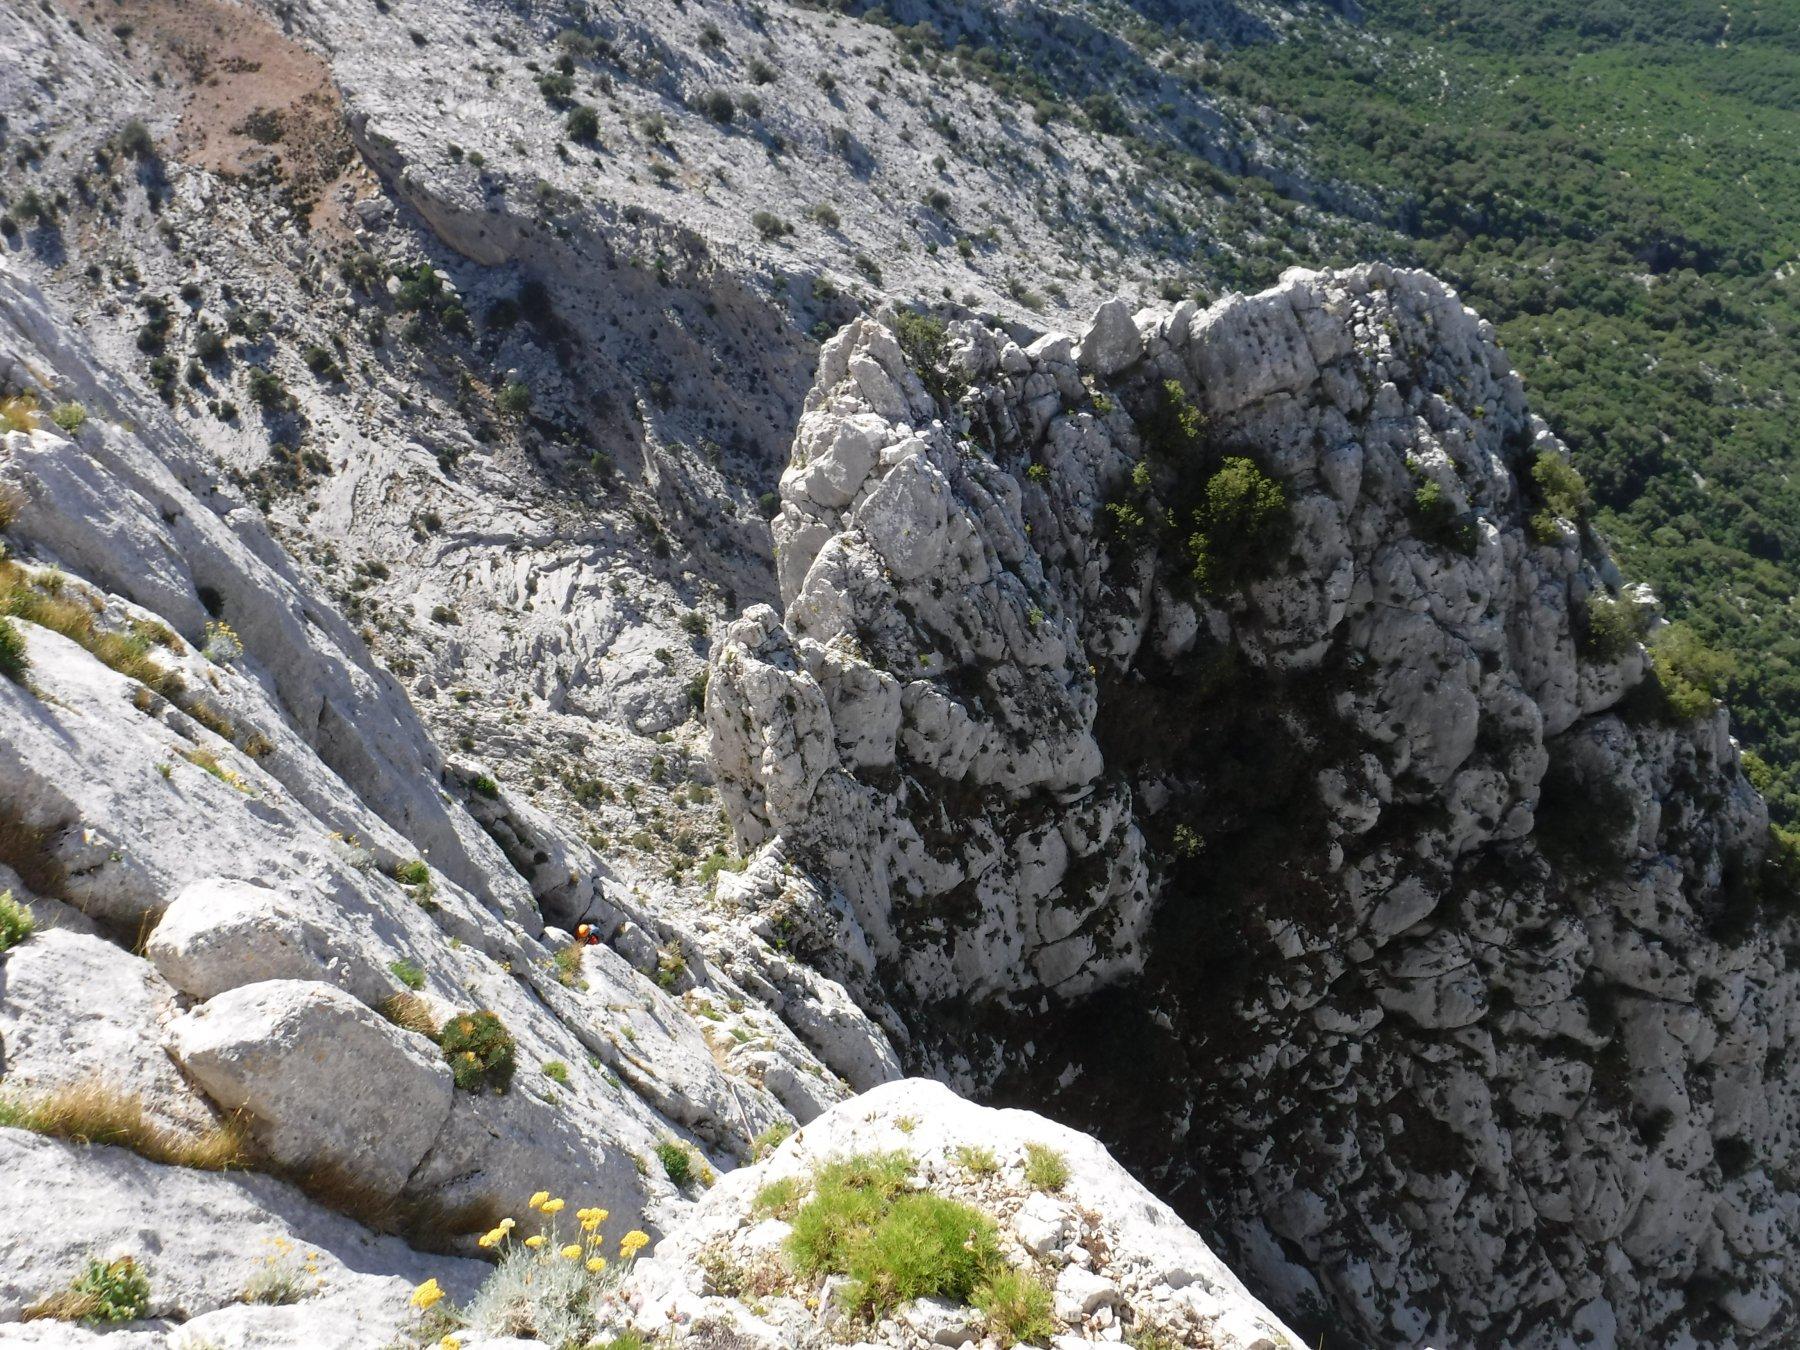 Cusidore (Punta) Via Legione Reale Truppe Leggere 2016-06-21